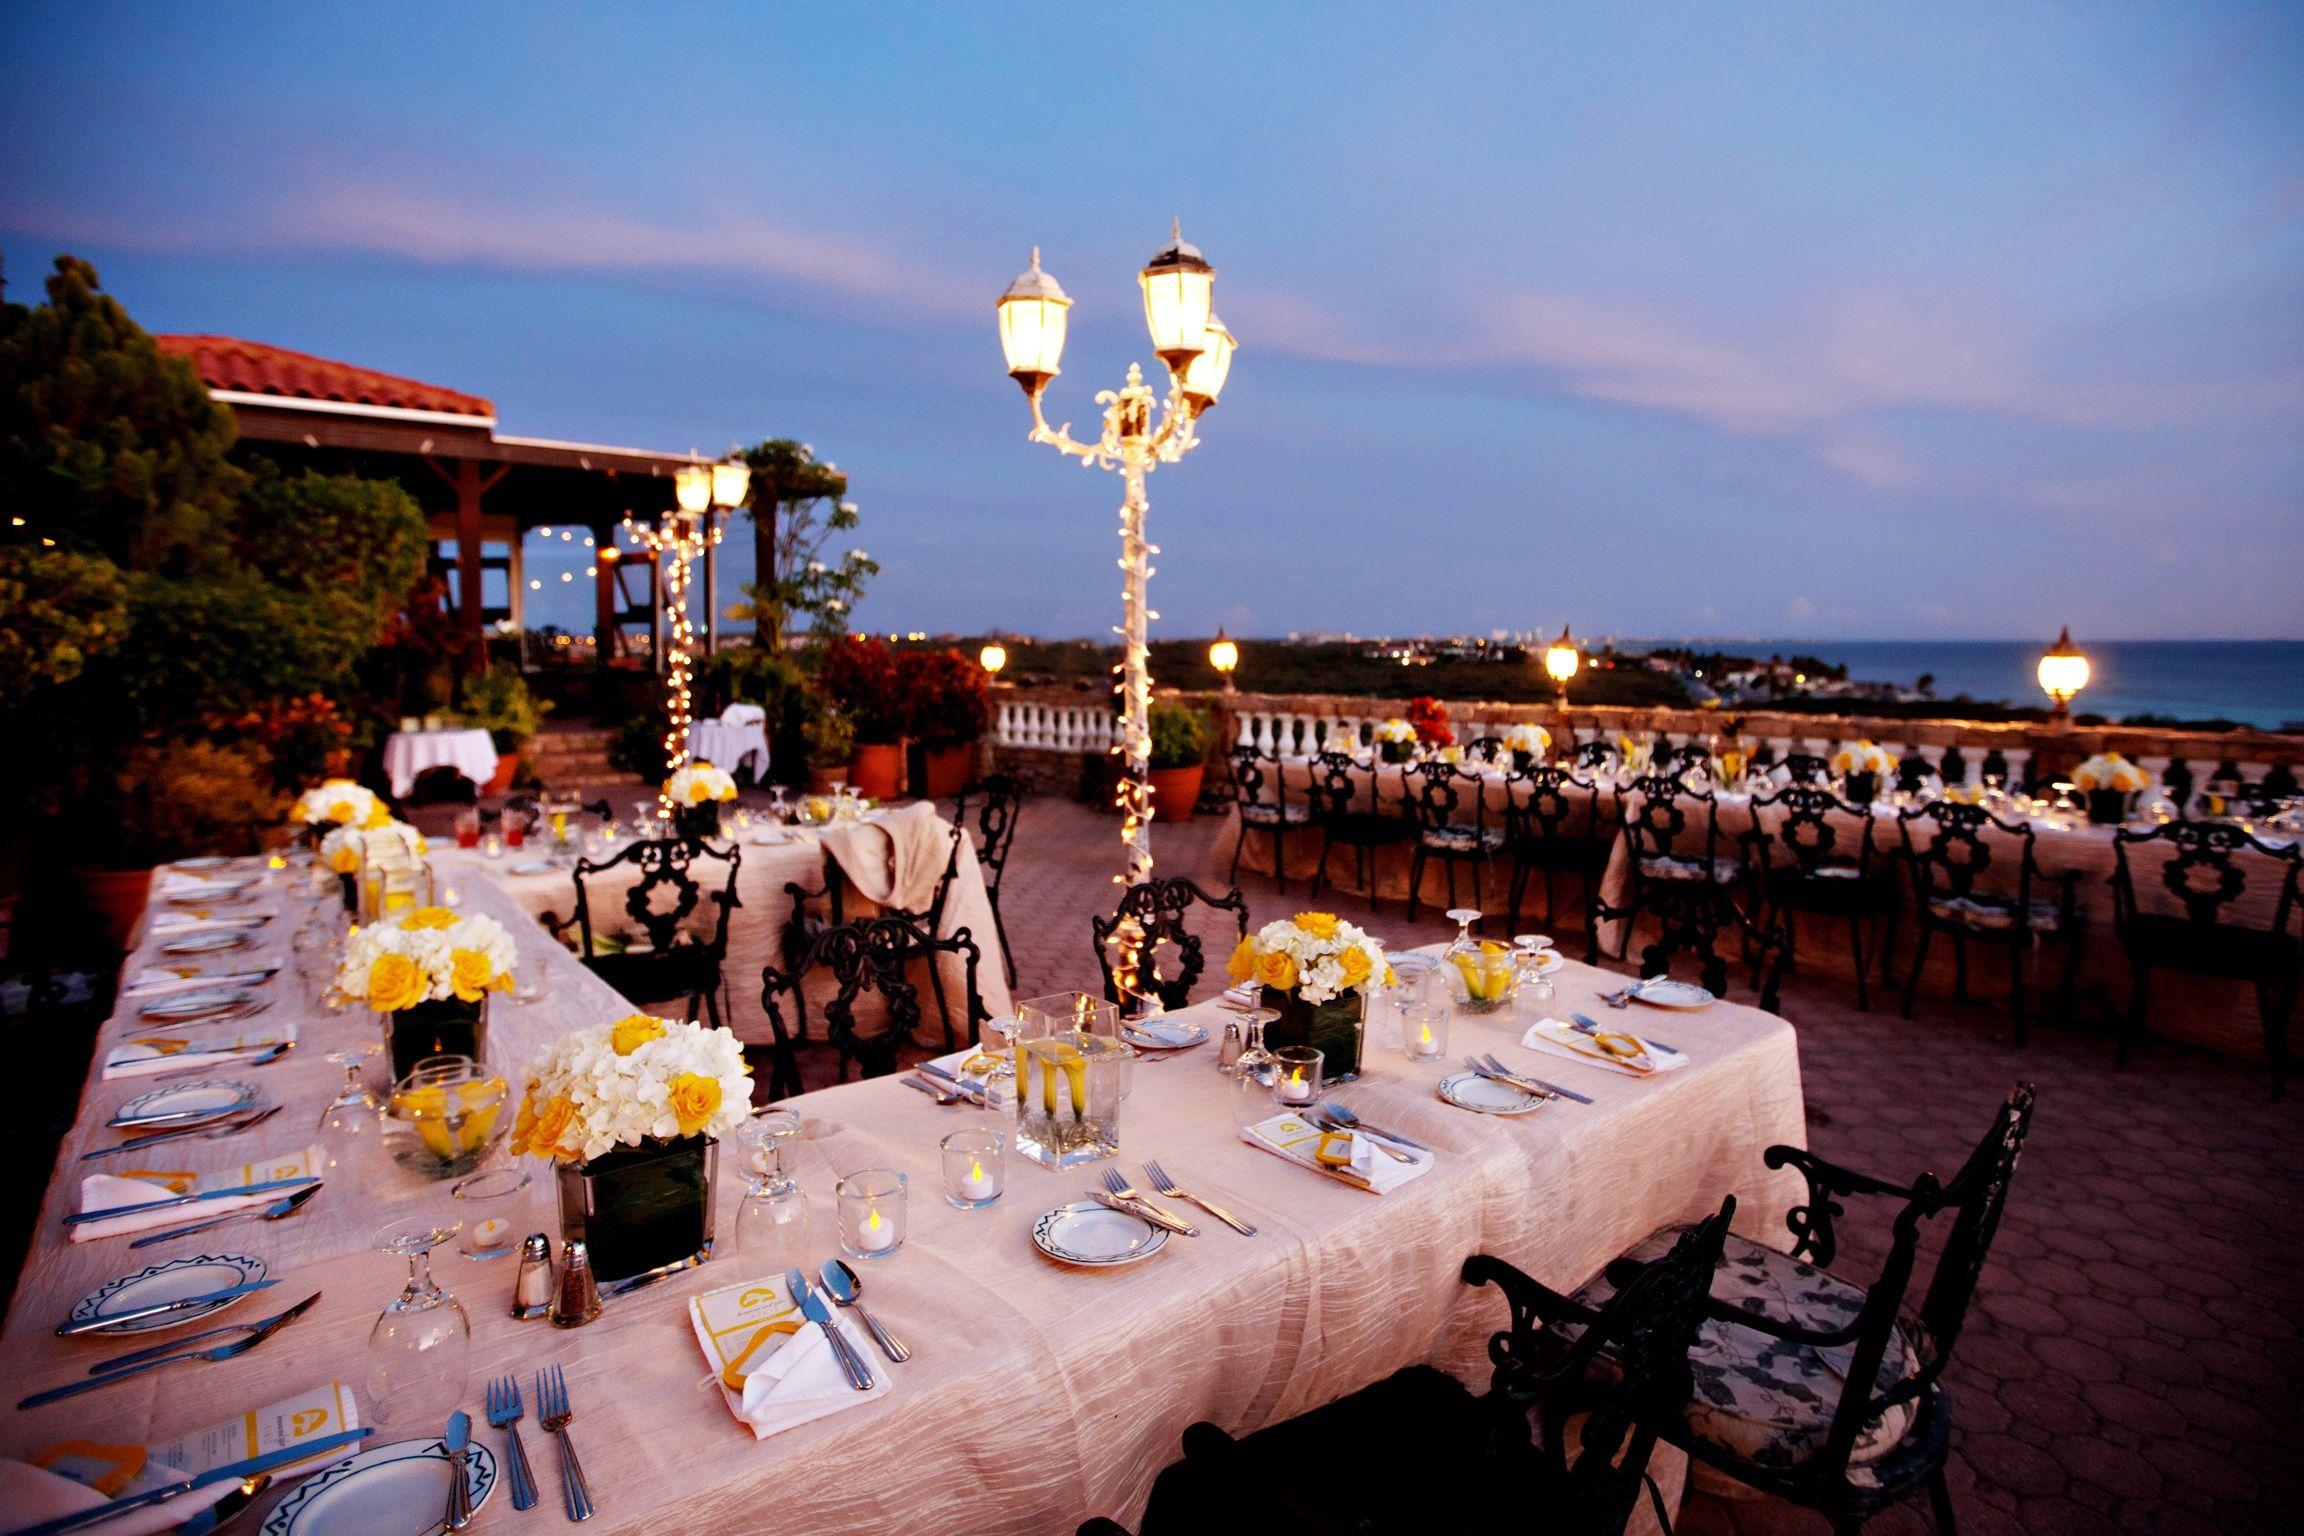 wedding reception dinner ideas on budget%0A Wedding Reception at La Trattoria El Faro Blanco Aruba